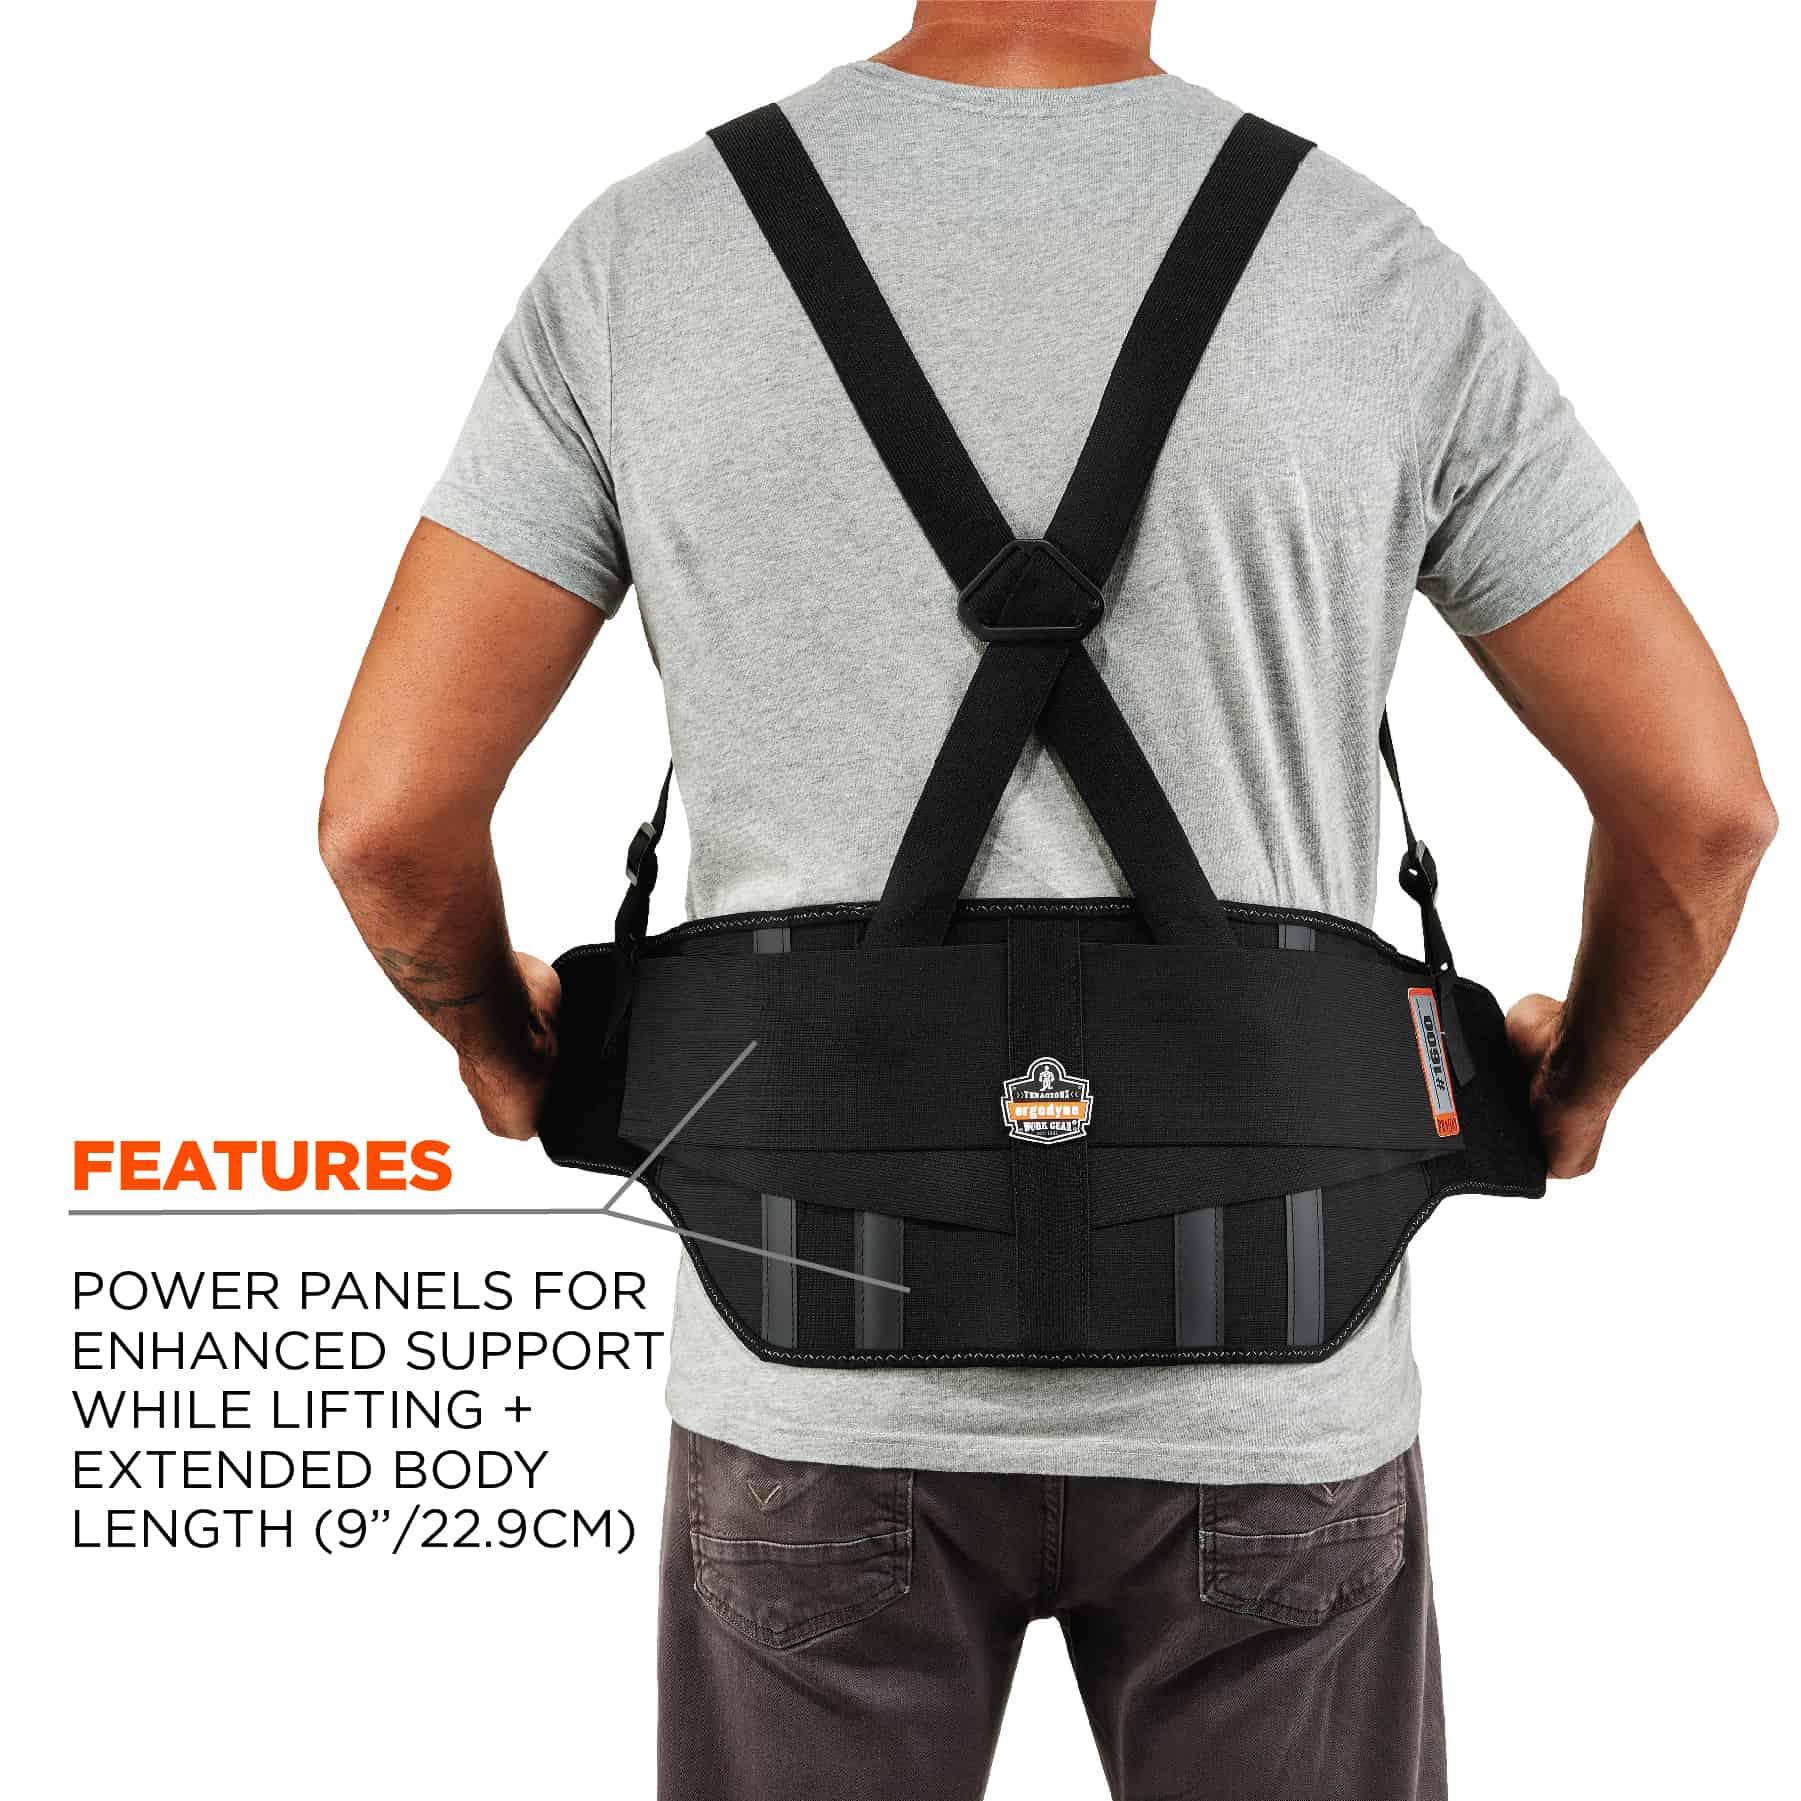 Ergodyne ProFlex 1500 Weight Lifters Style Back Support Belt Black Large